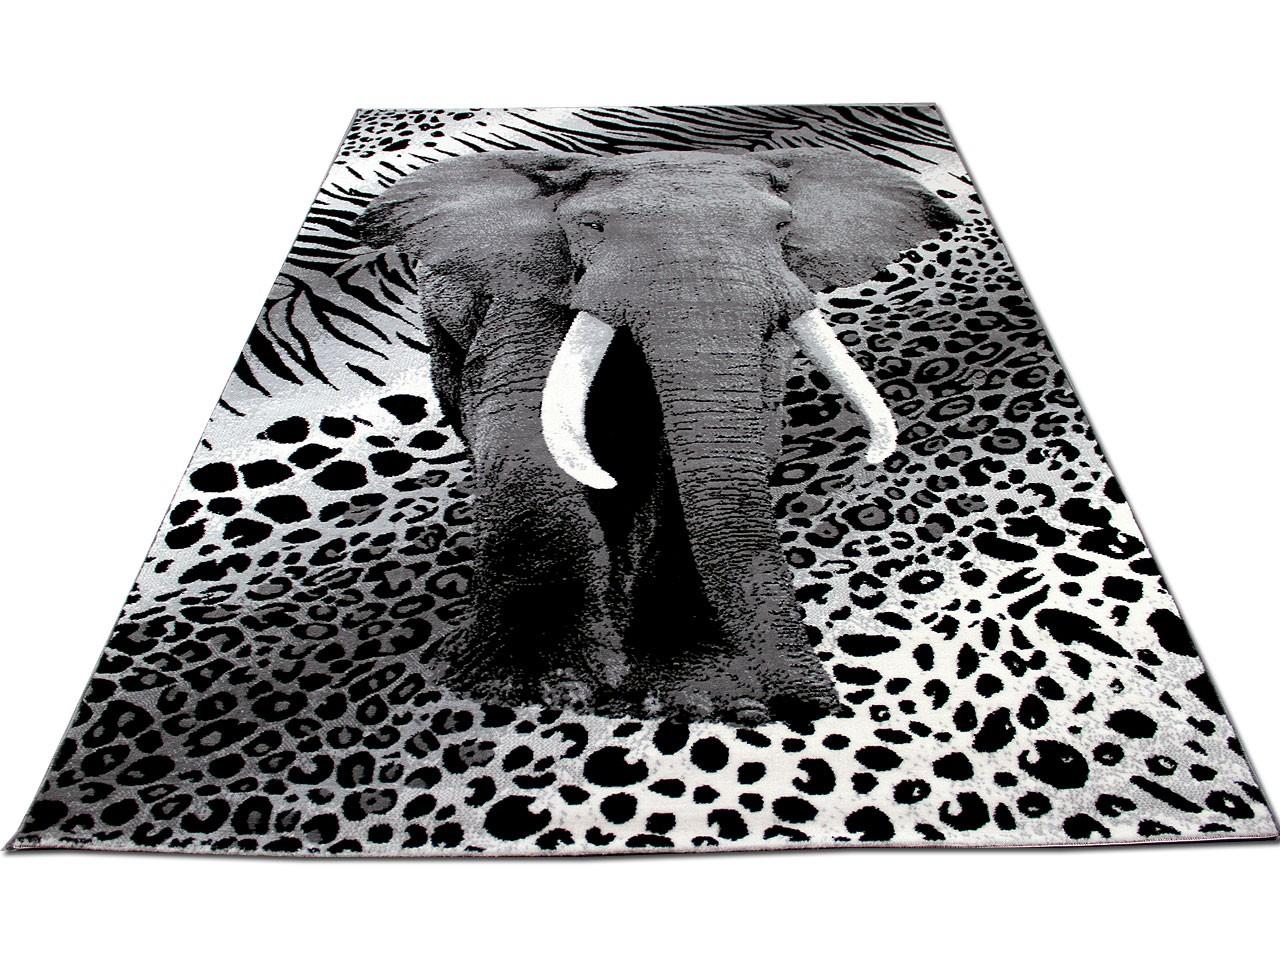 designer teppich carat elefant grau teppiche designerteppiche carat designer. Black Bedroom Furniture Sets. Home Design Ideas